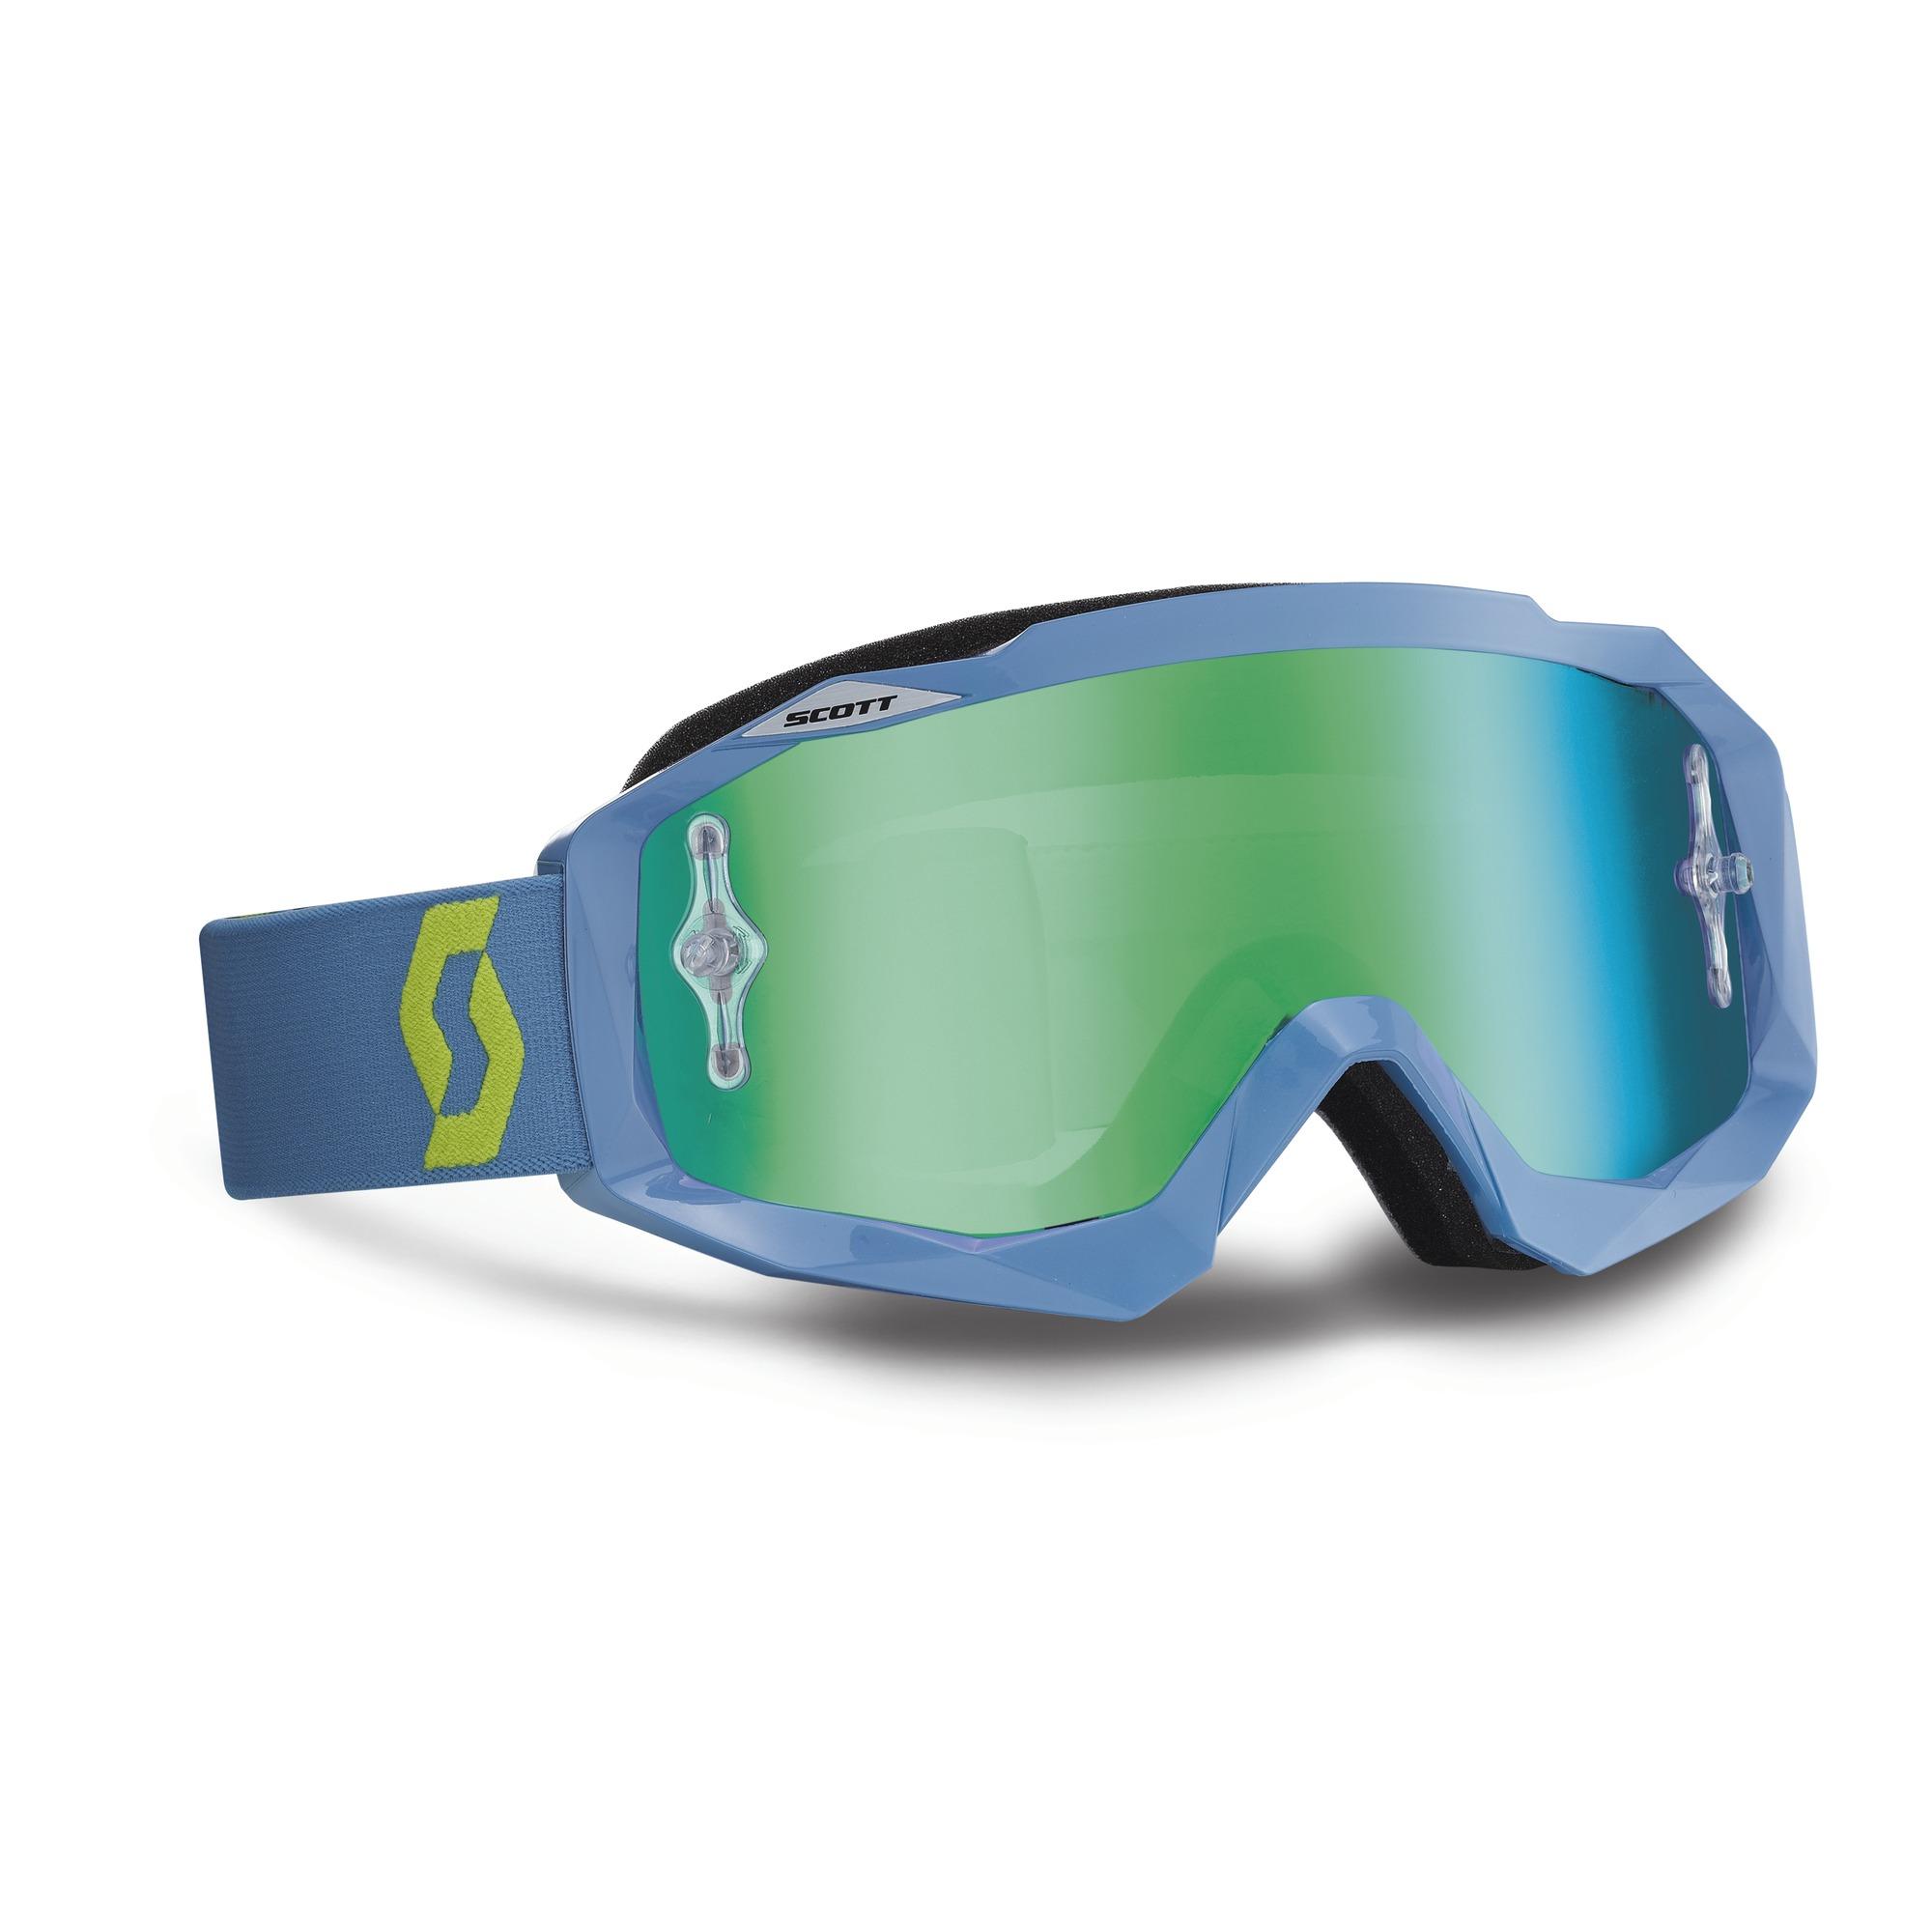 Scott Oxide Hustle MX cross goggles steal Grey Green